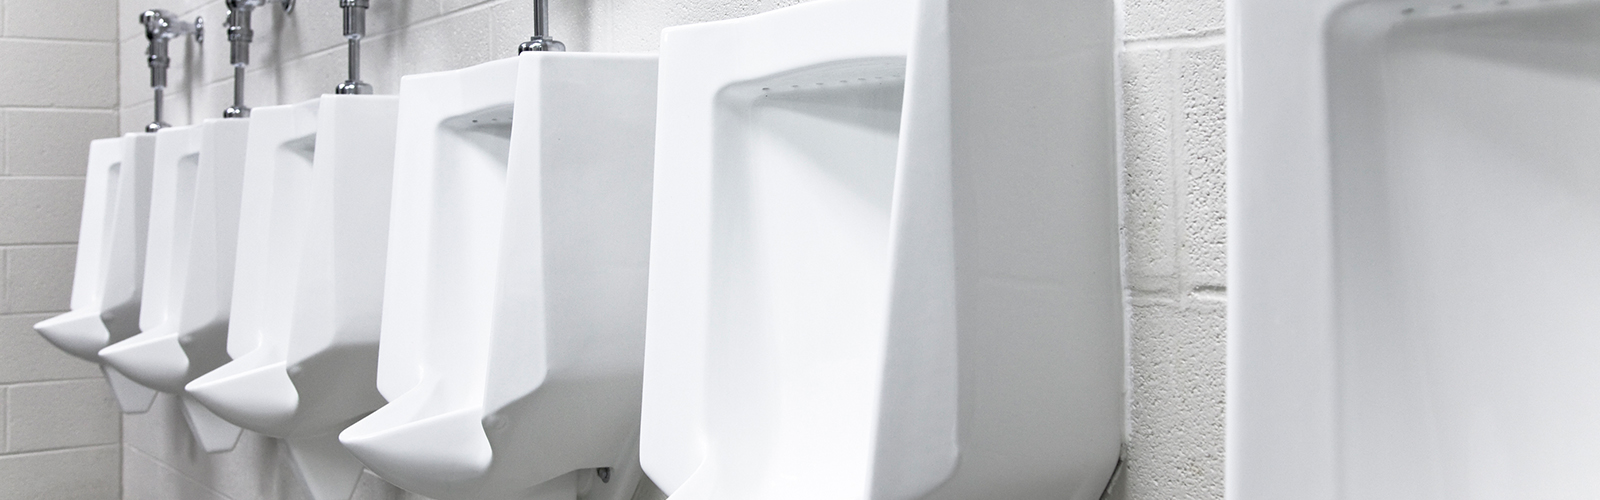 Odor Control Spartan Chemical - Bathroom odor control